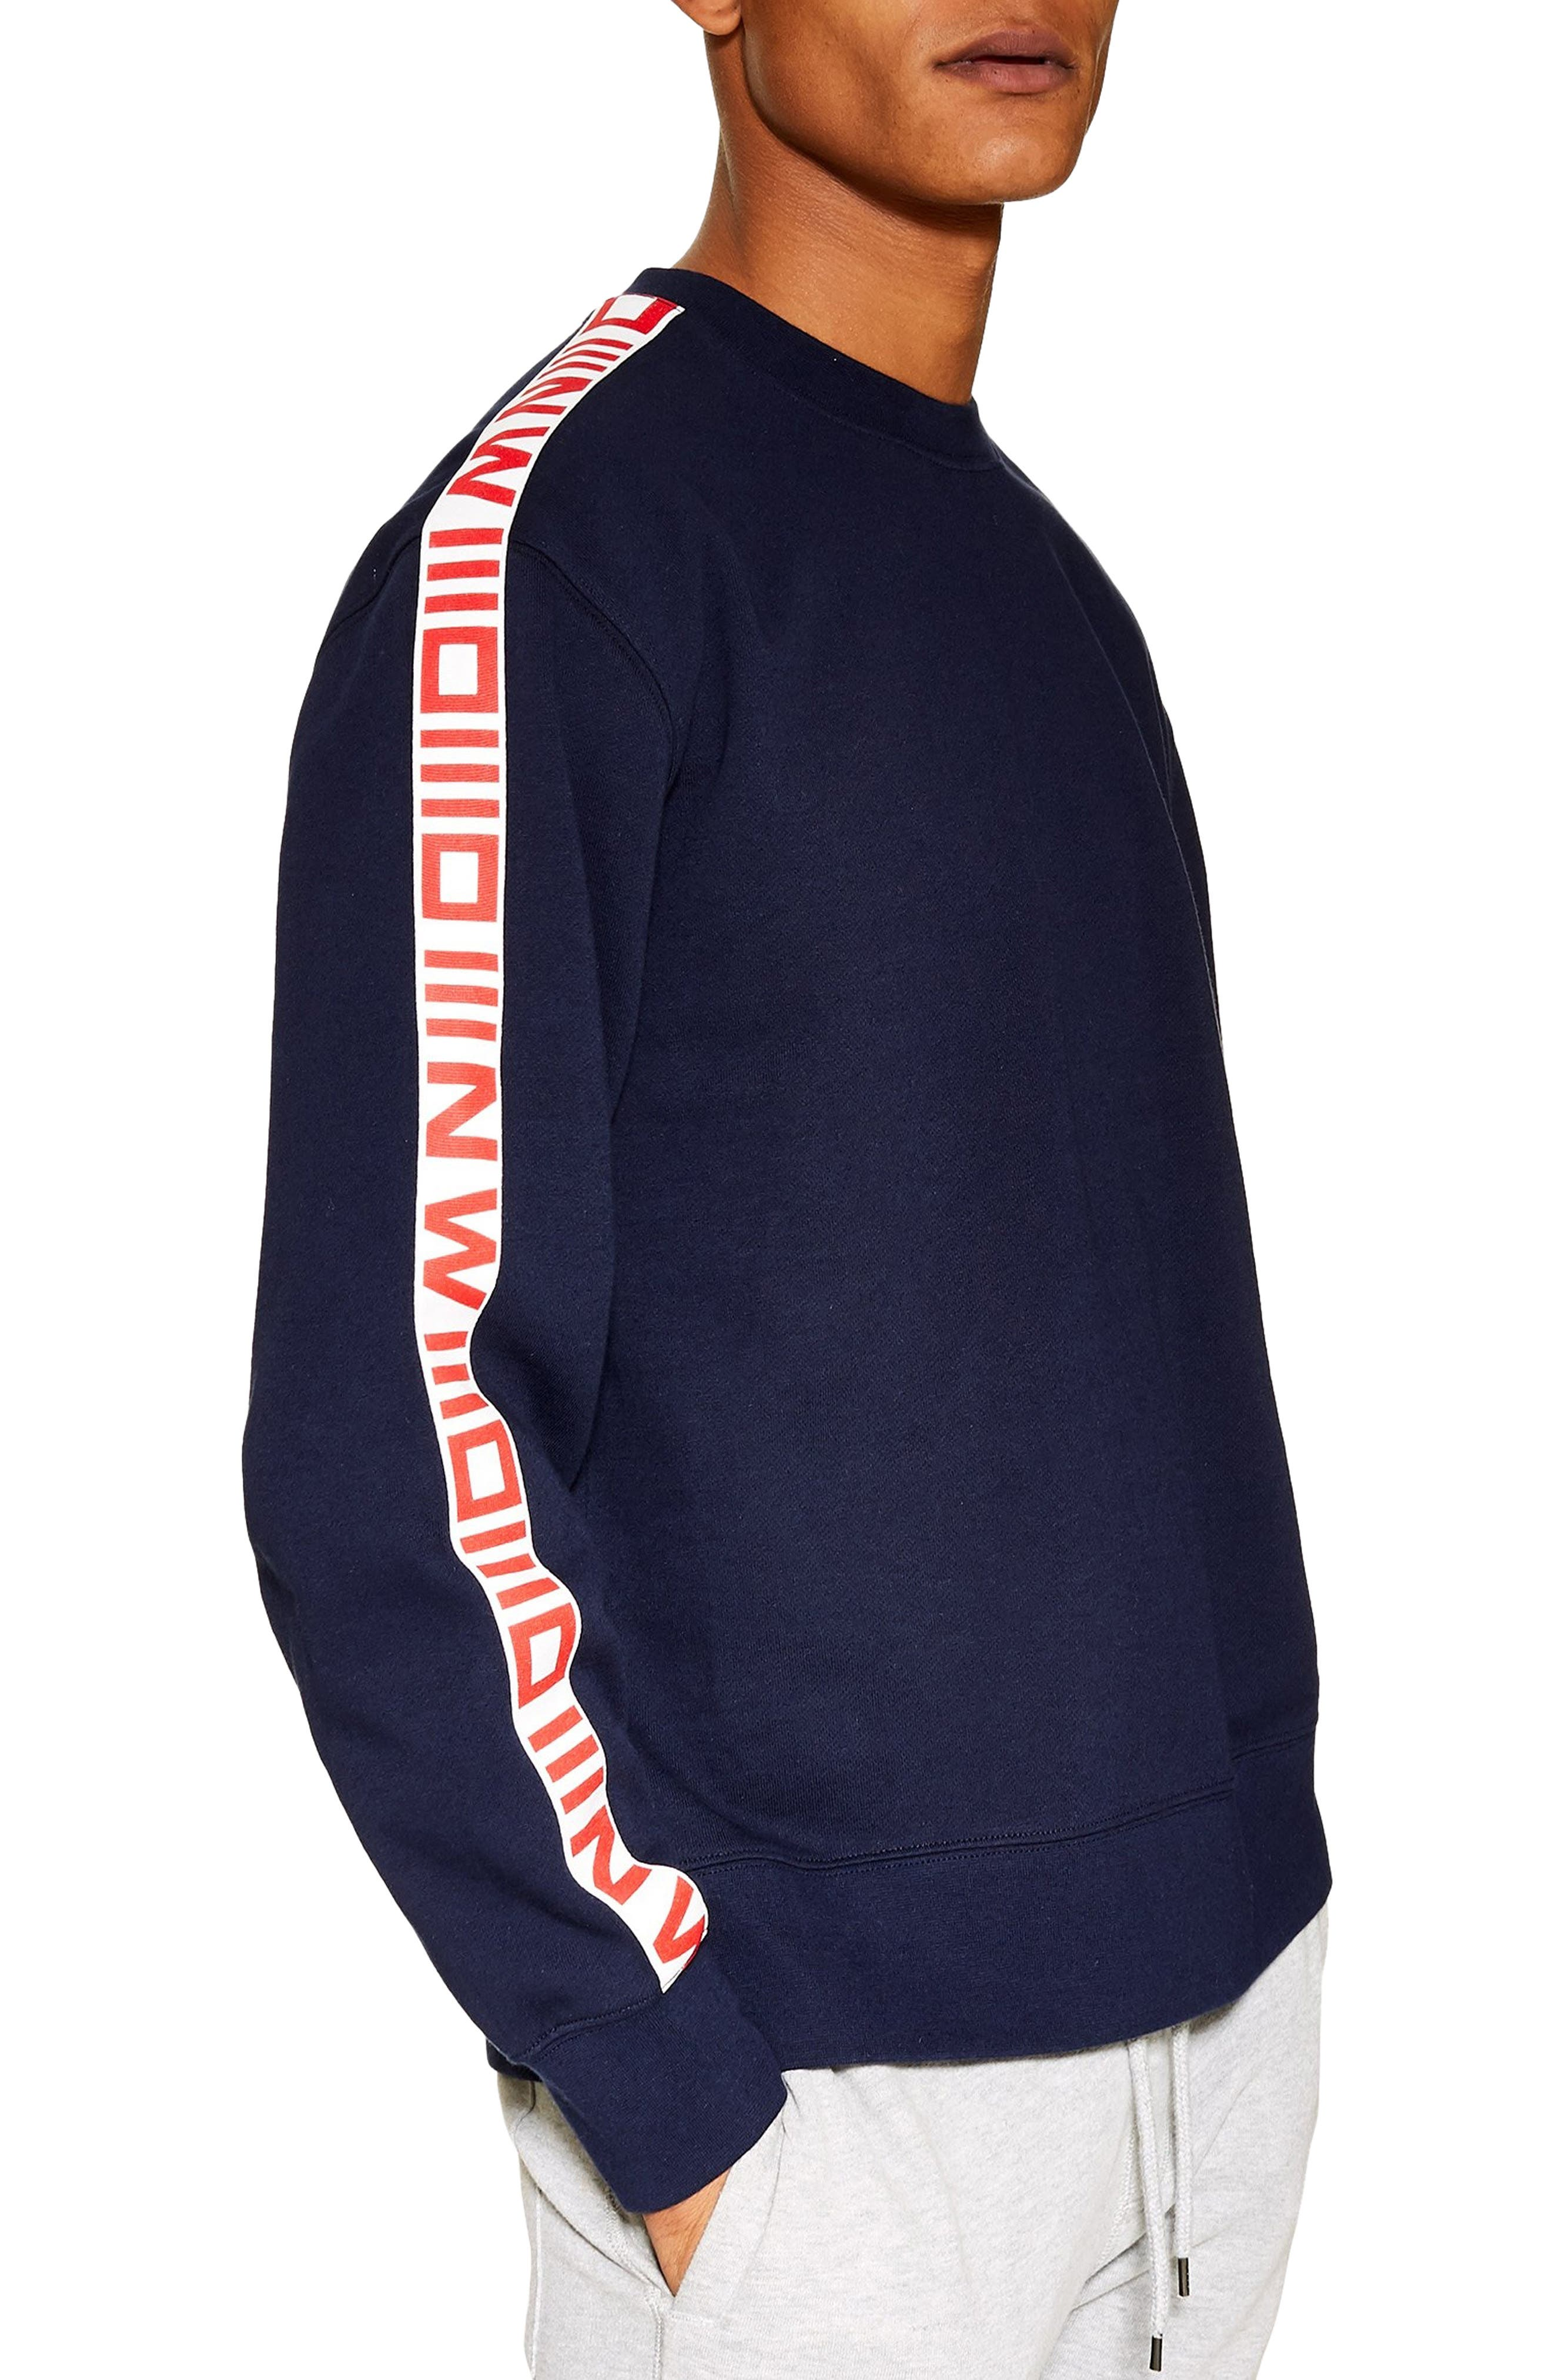 TOPMAN Taped Crewneck Sweatshirt, Main, color, NAVY MULTI